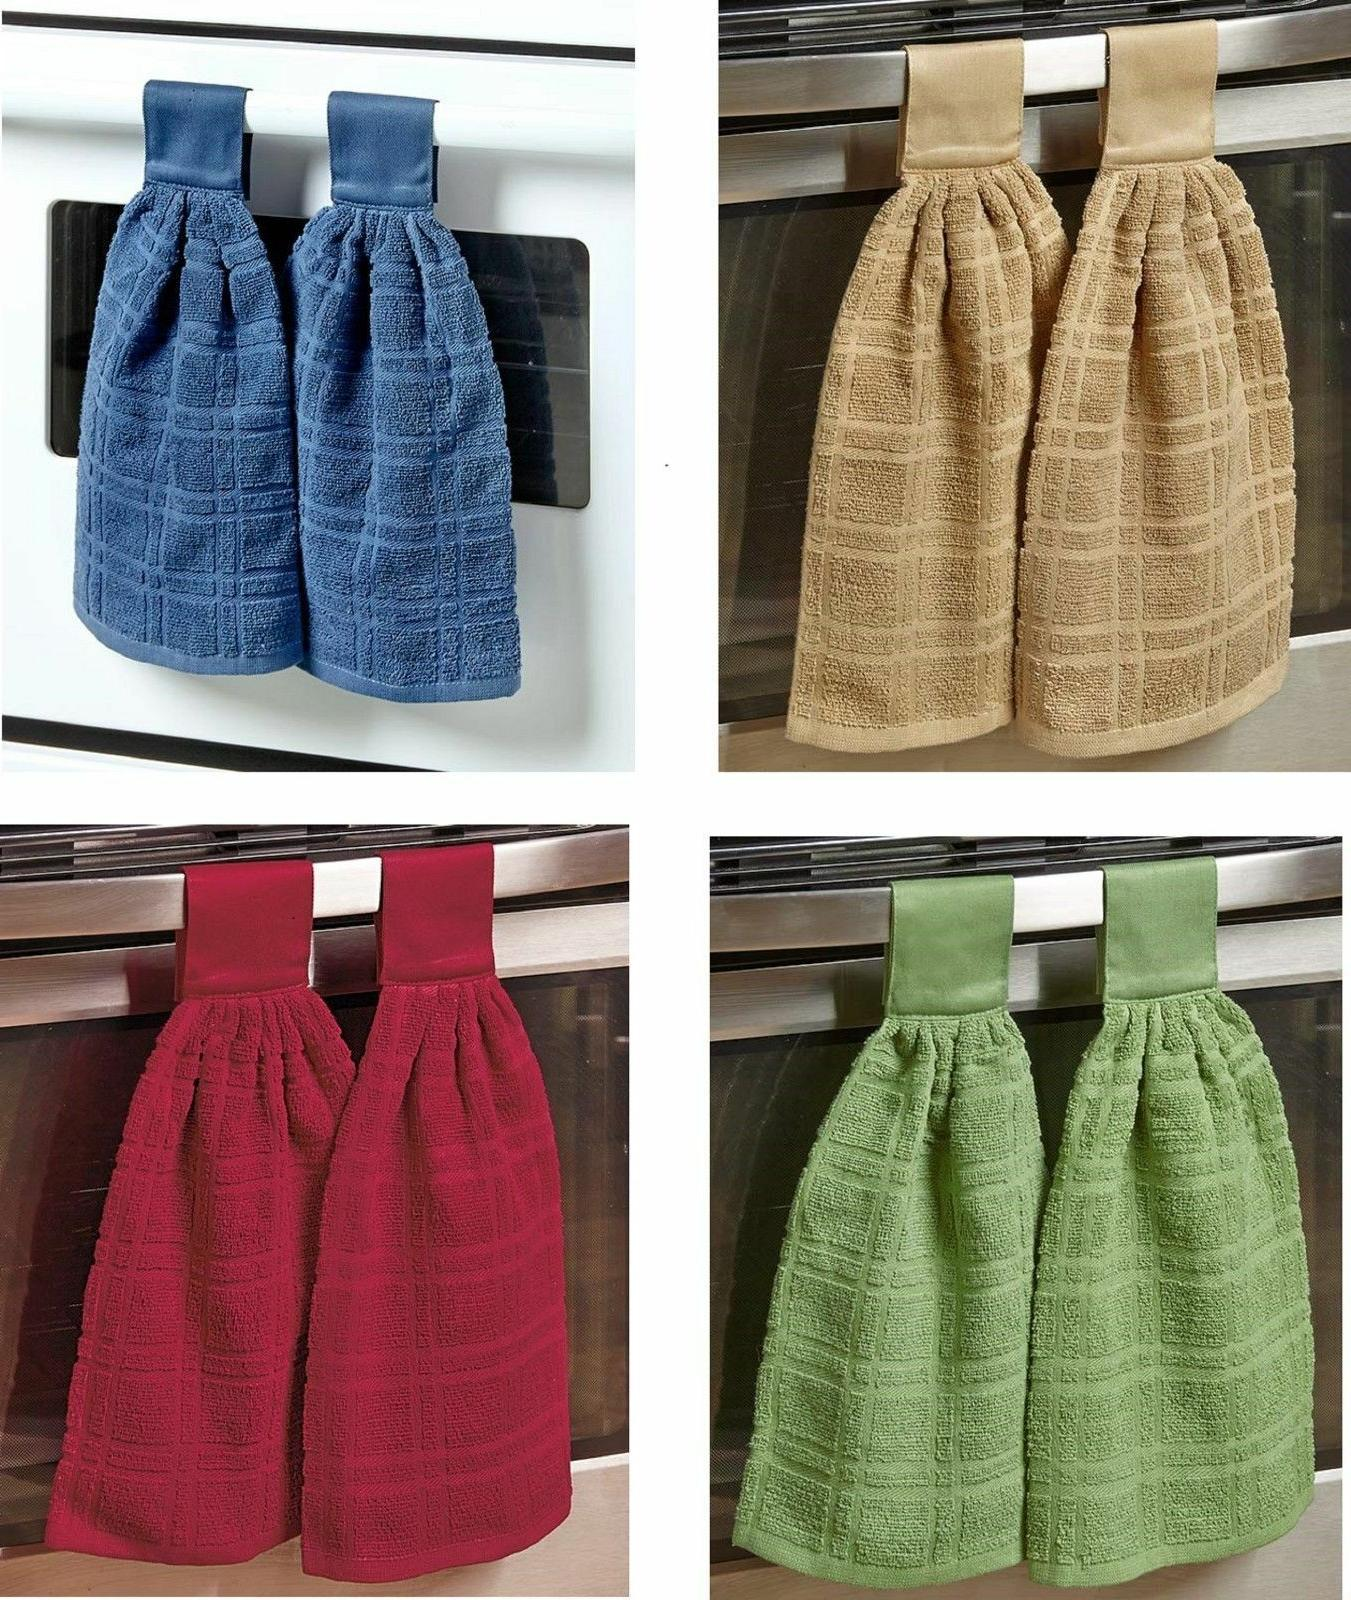 set of 2 hanging cotton kitchen towels